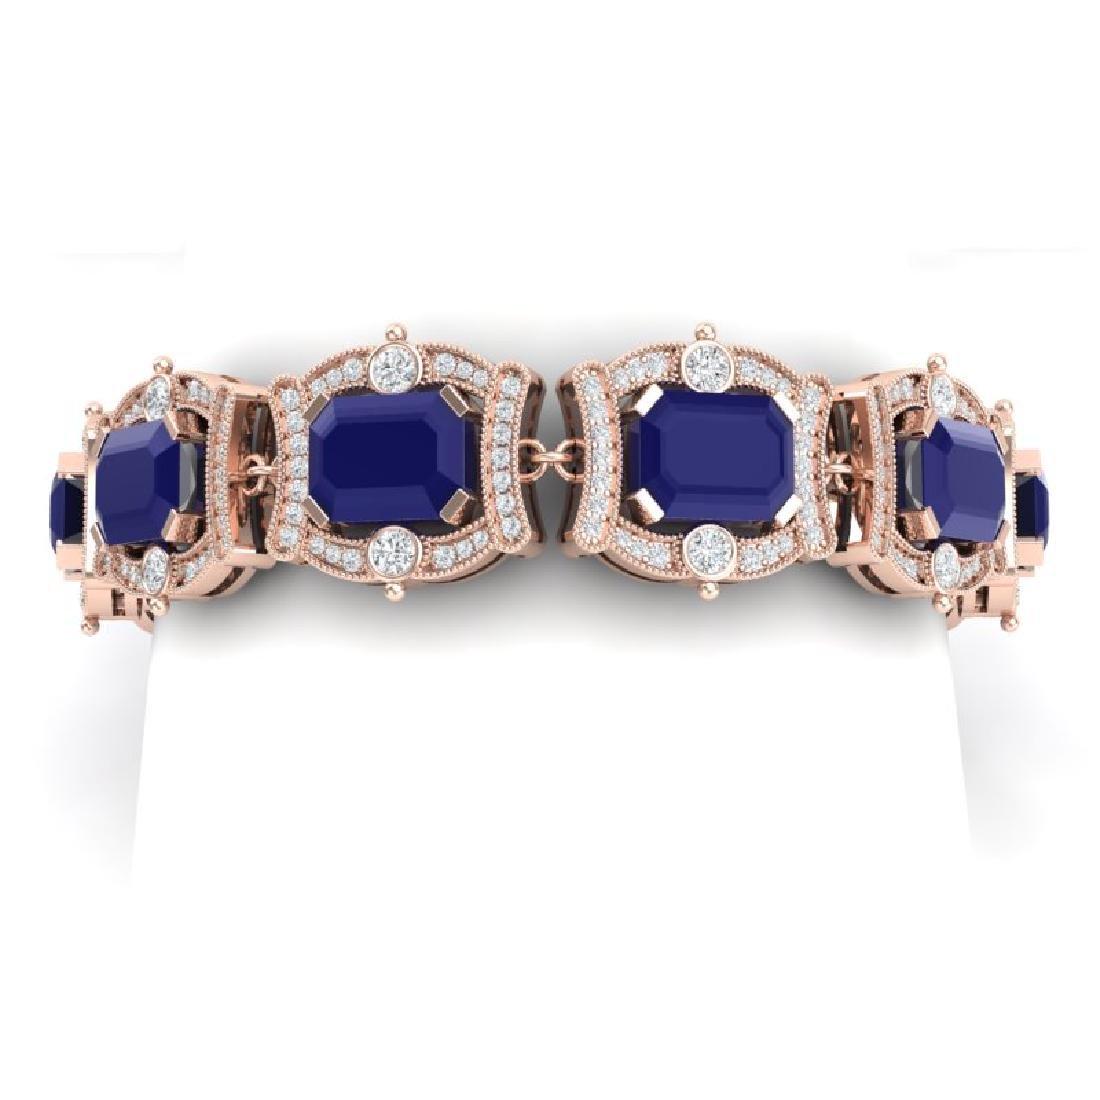 43.87 CTW Royalty Sapphire & VS Diamond Bracelet 18K